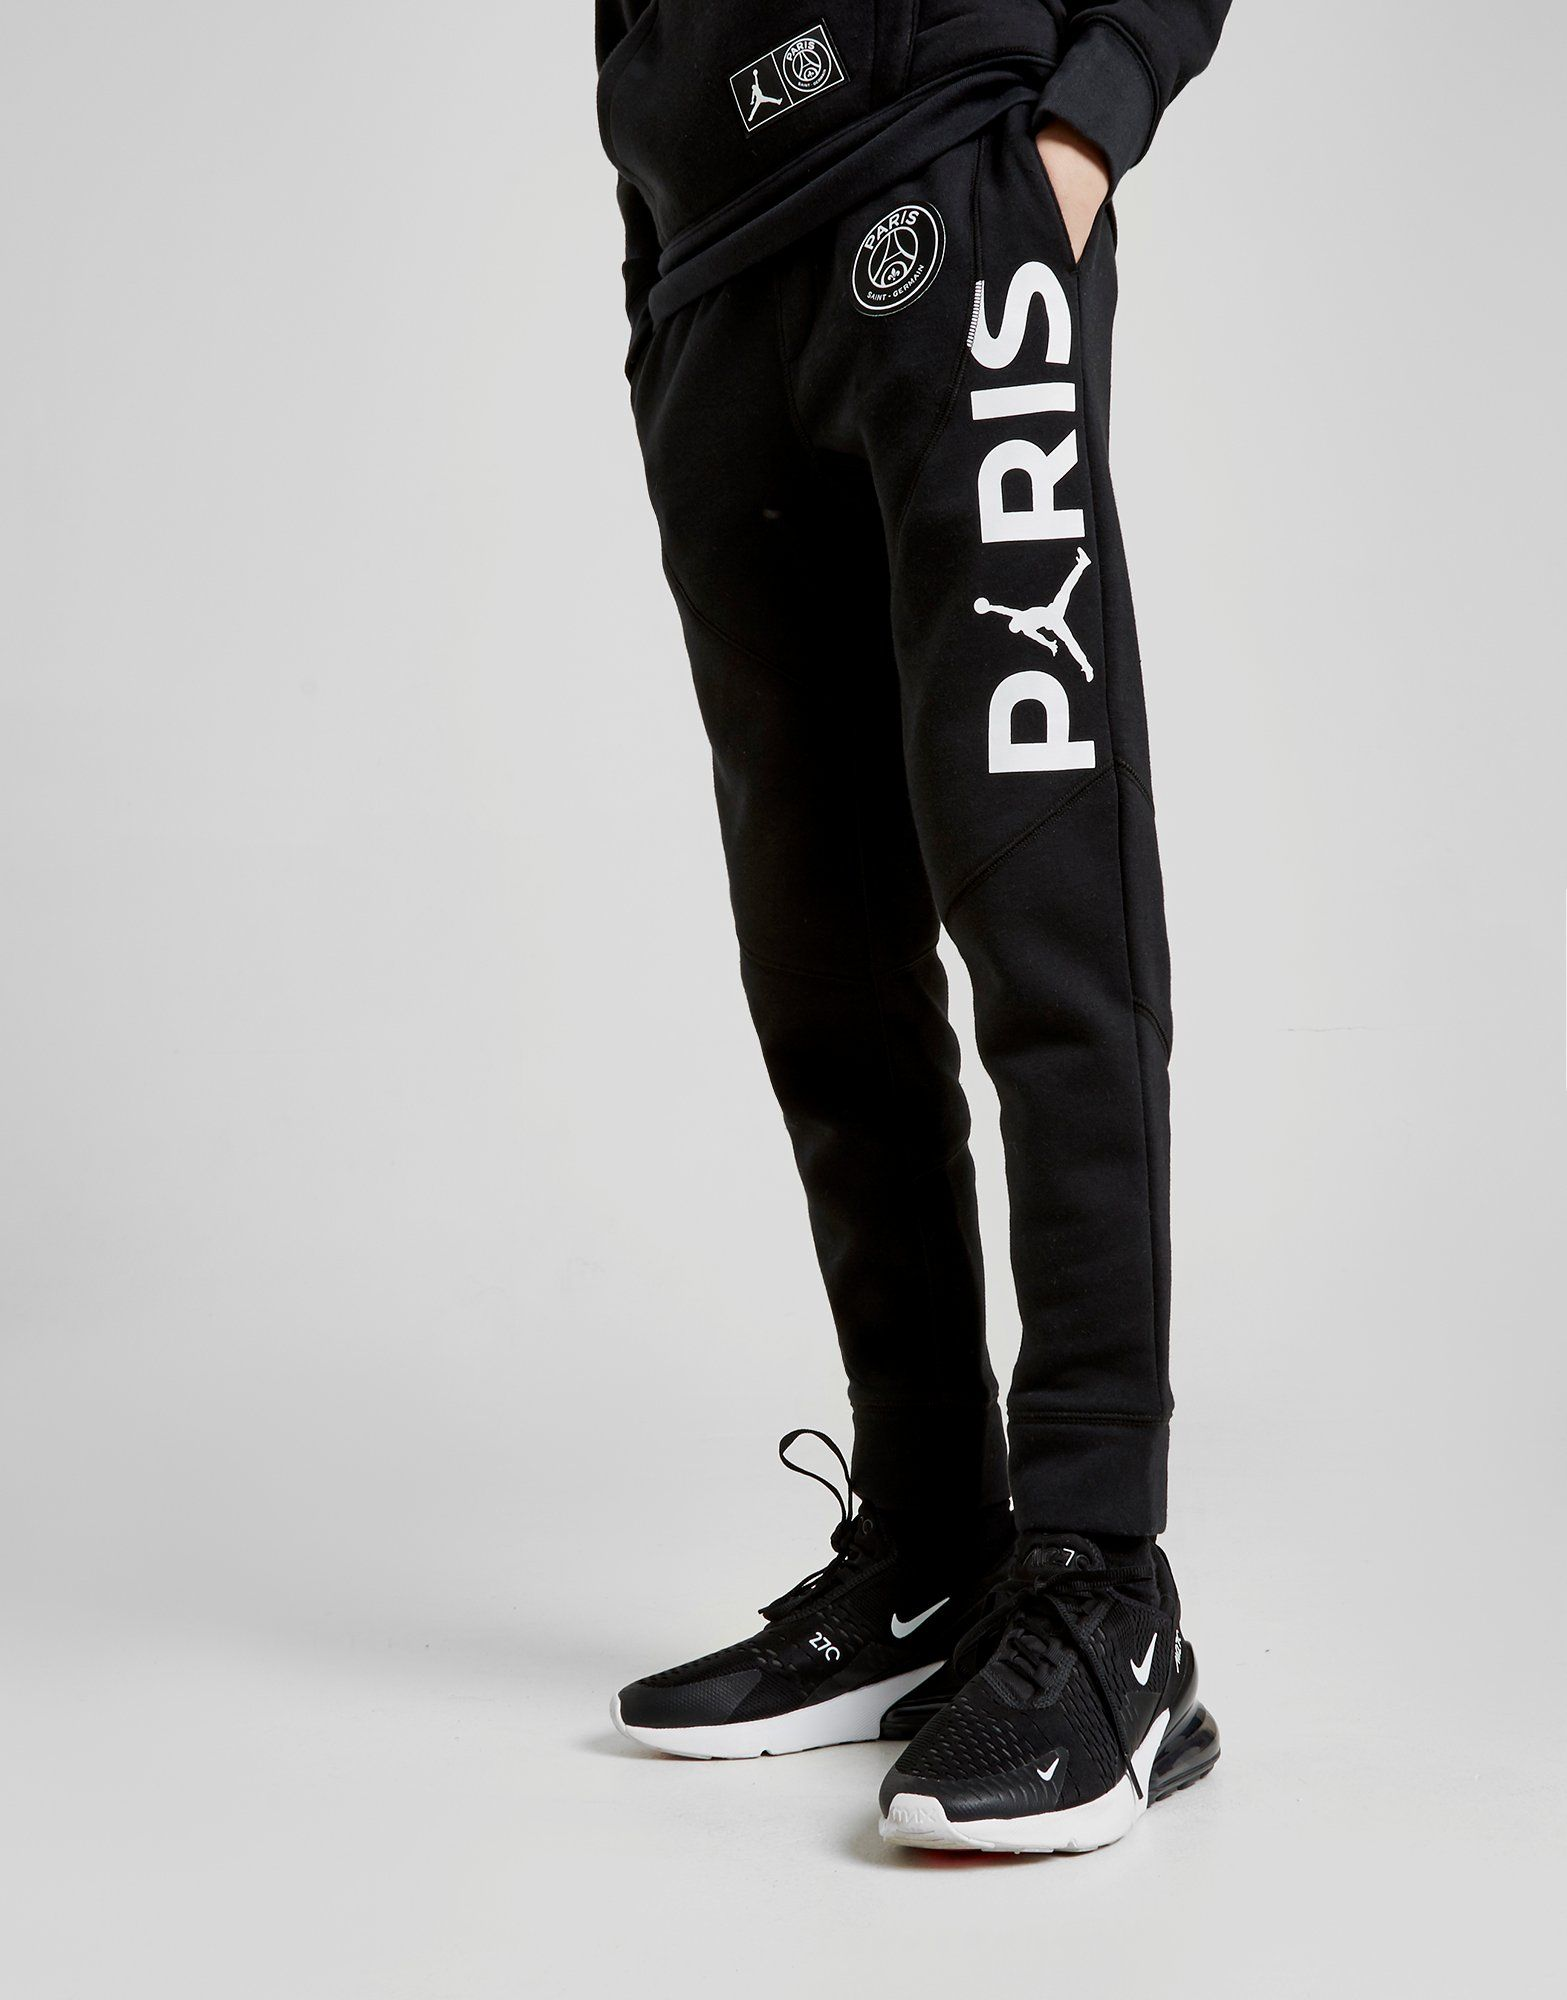 Jordan x Paris Saint Germain Wings Track Pants